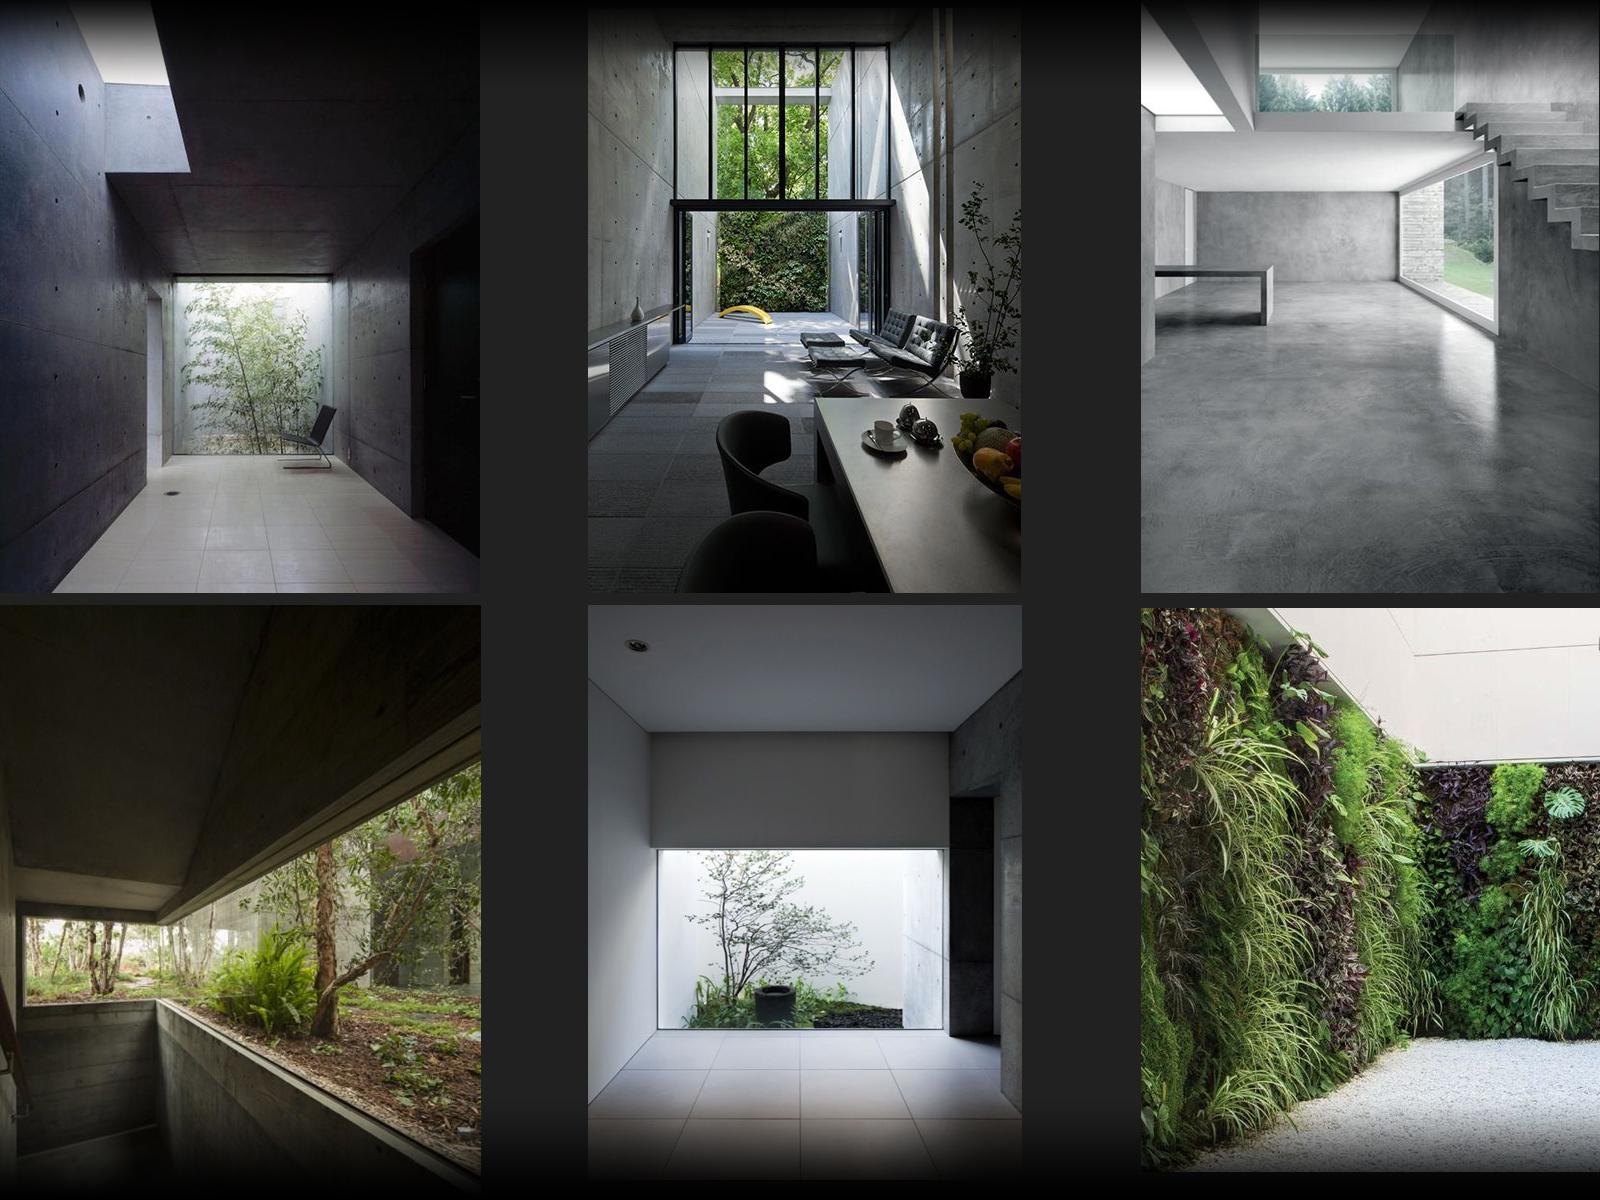 mad-gfx-warehouse-v1-6.jpg